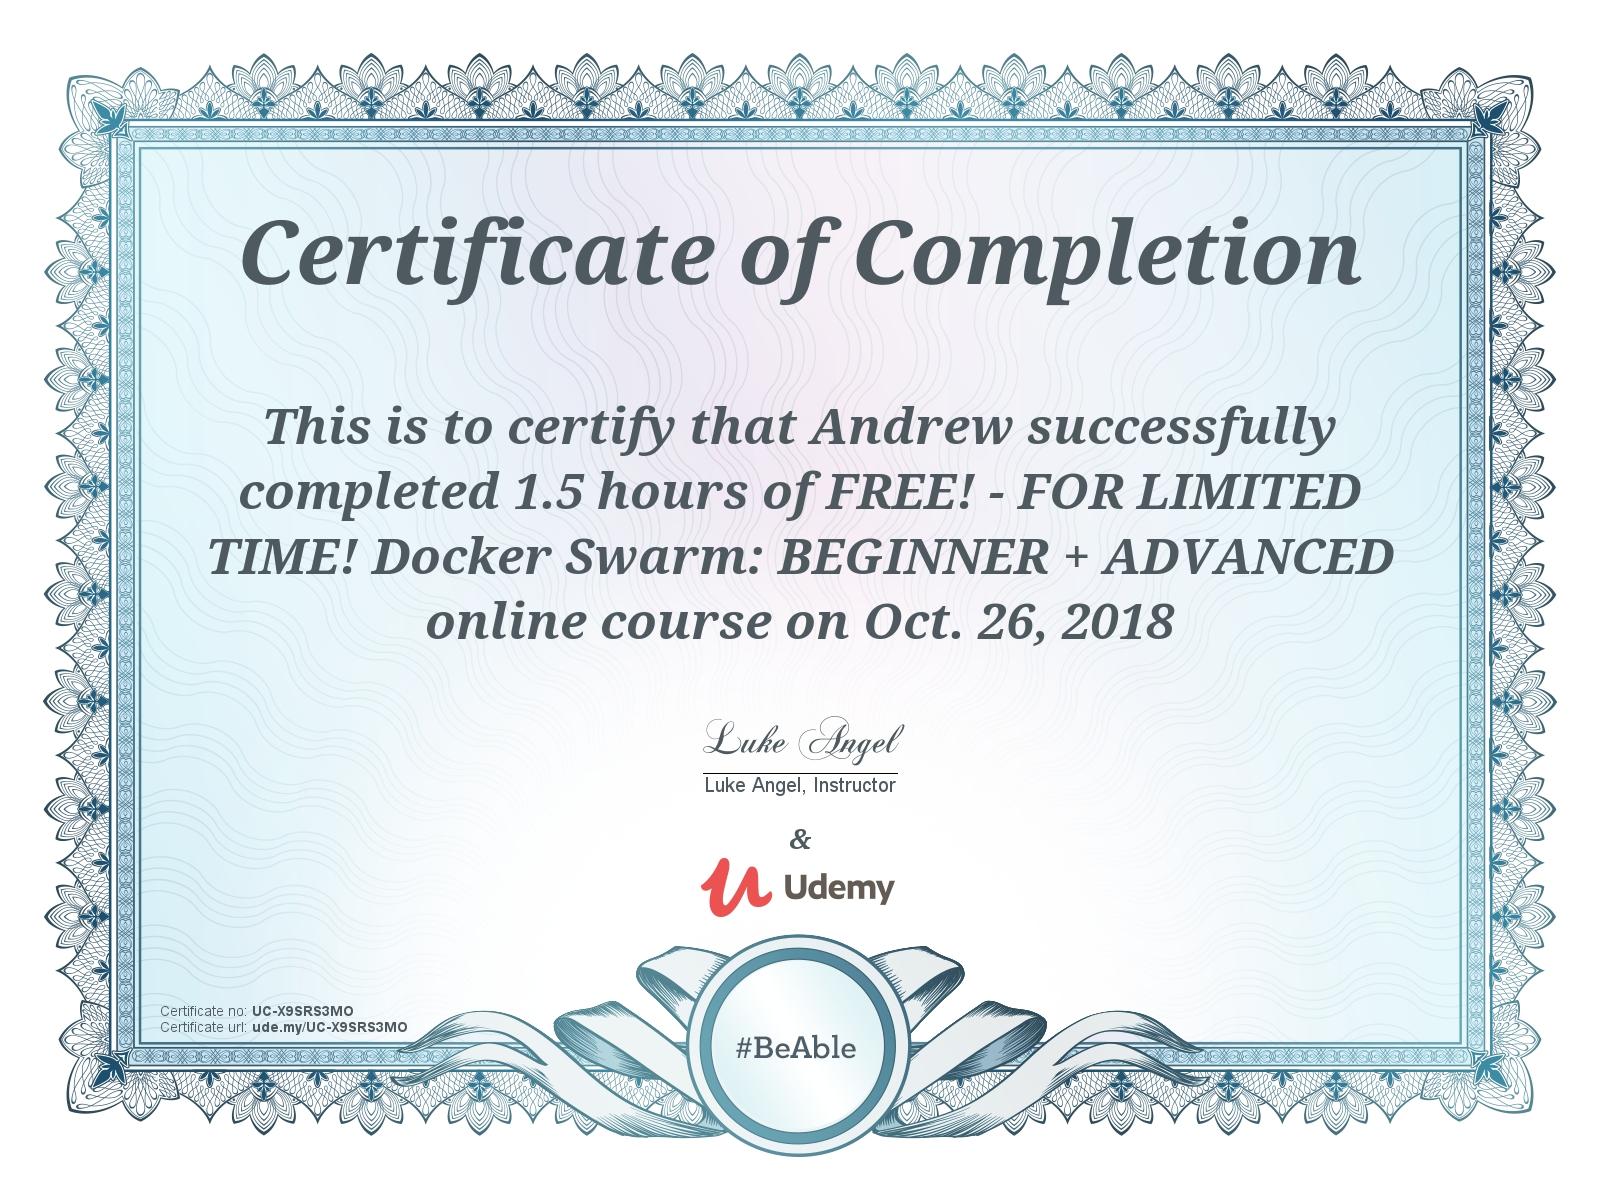 Review of Udemy's Docker Swarm: Beginner + Advanced · Ponderings of